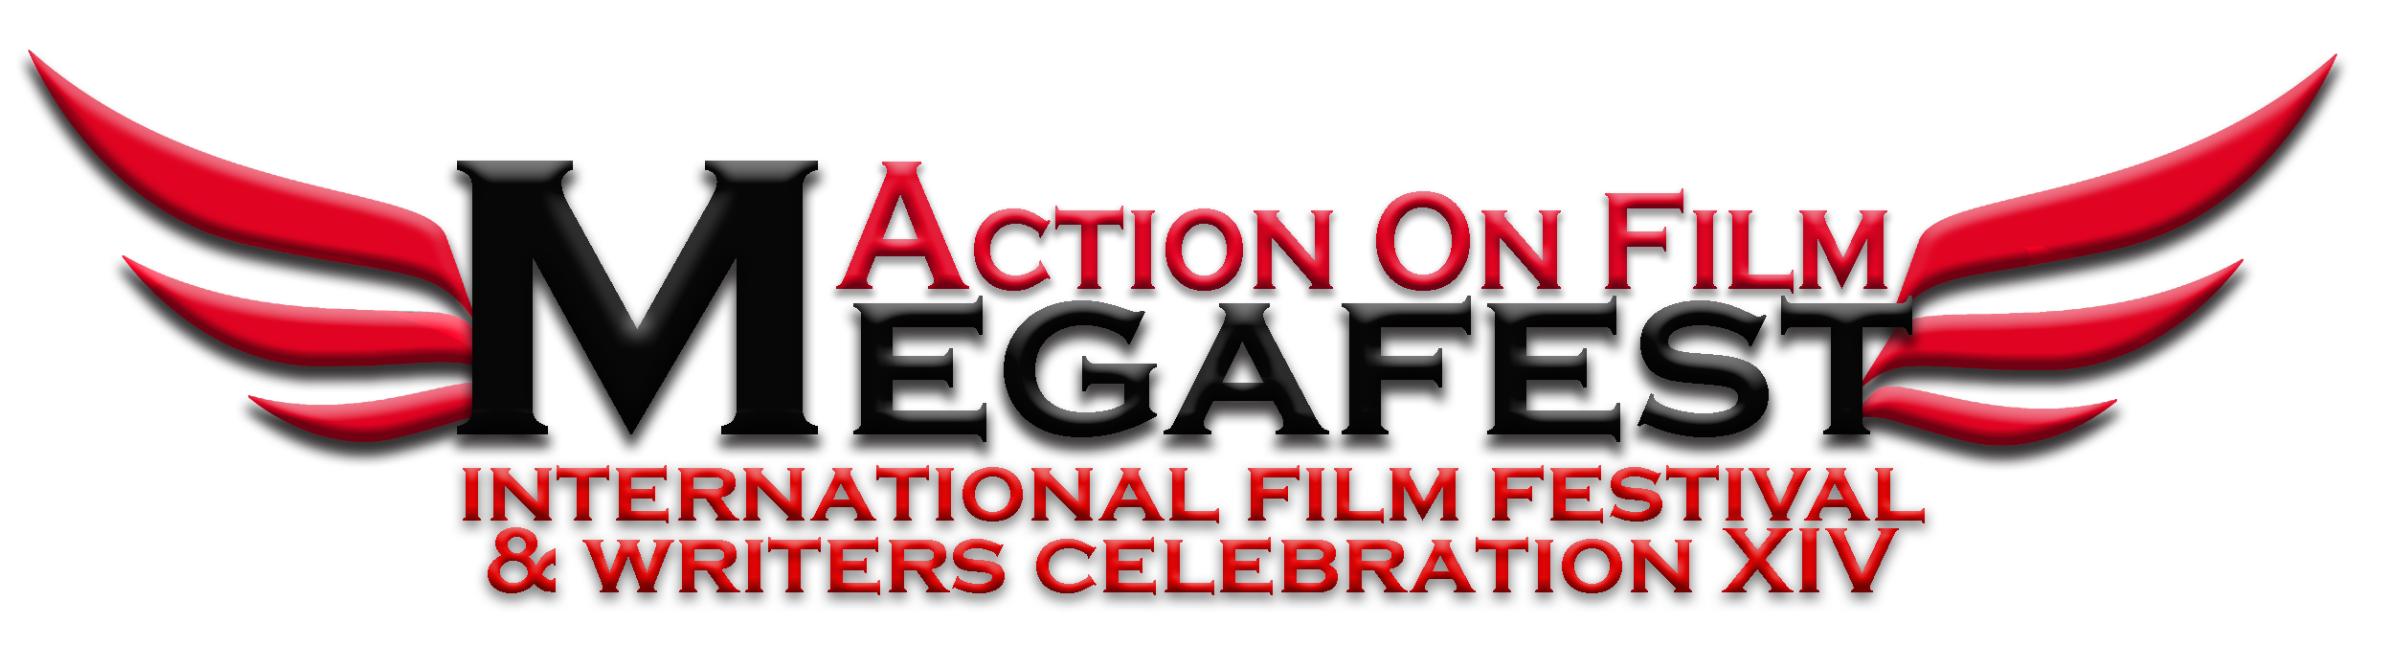 Action On Film MEGAFEST Film Festival & Writers Competition Las Vegas